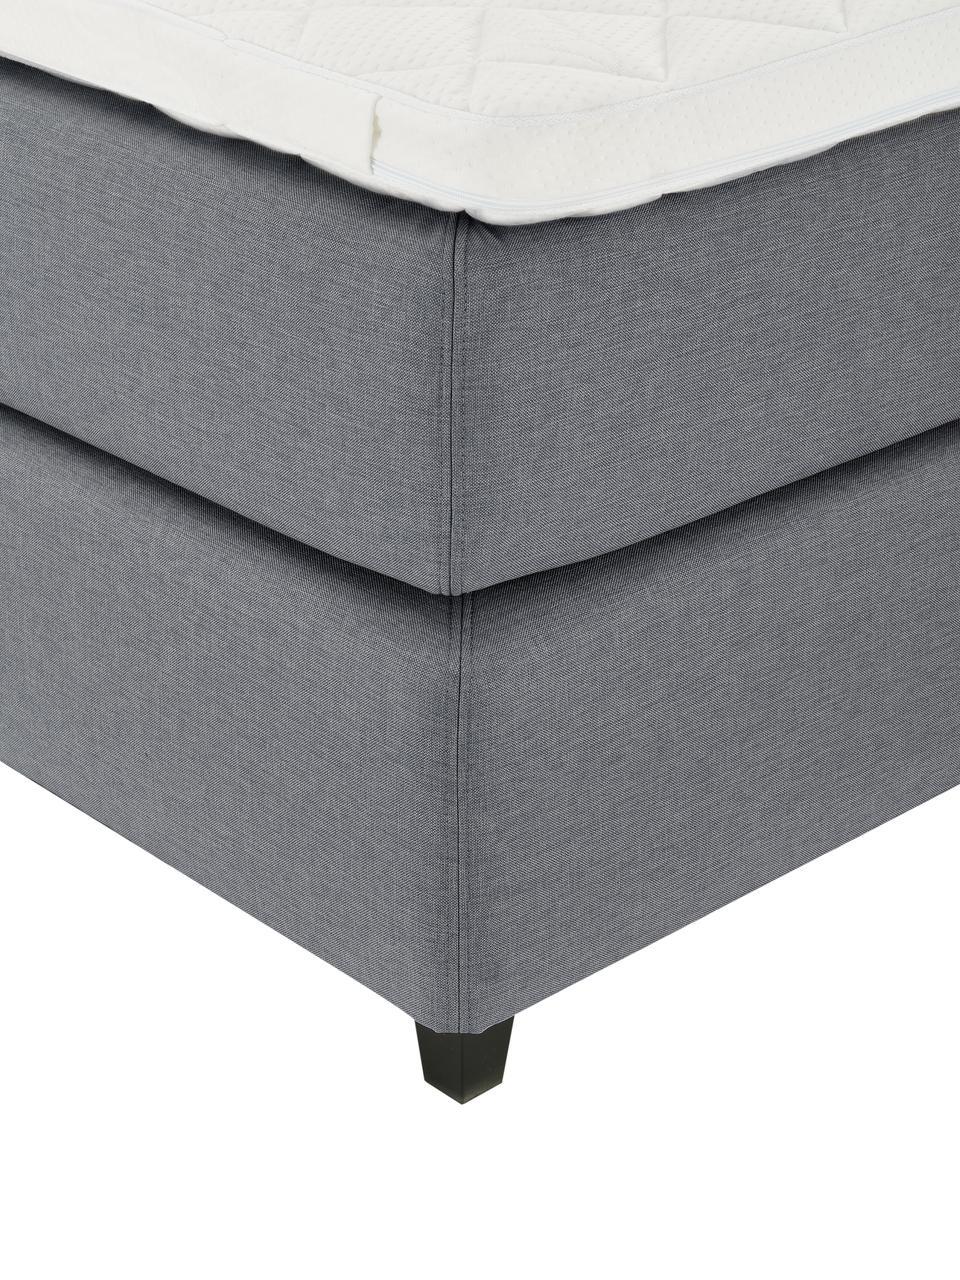 Premium Boxspringbett Royal in Grau, Matratze: 5-Zonen-Taschenfederkern, Füße: Massives Birkenholz, lack, Stoff Grau, 200 x 200 cm